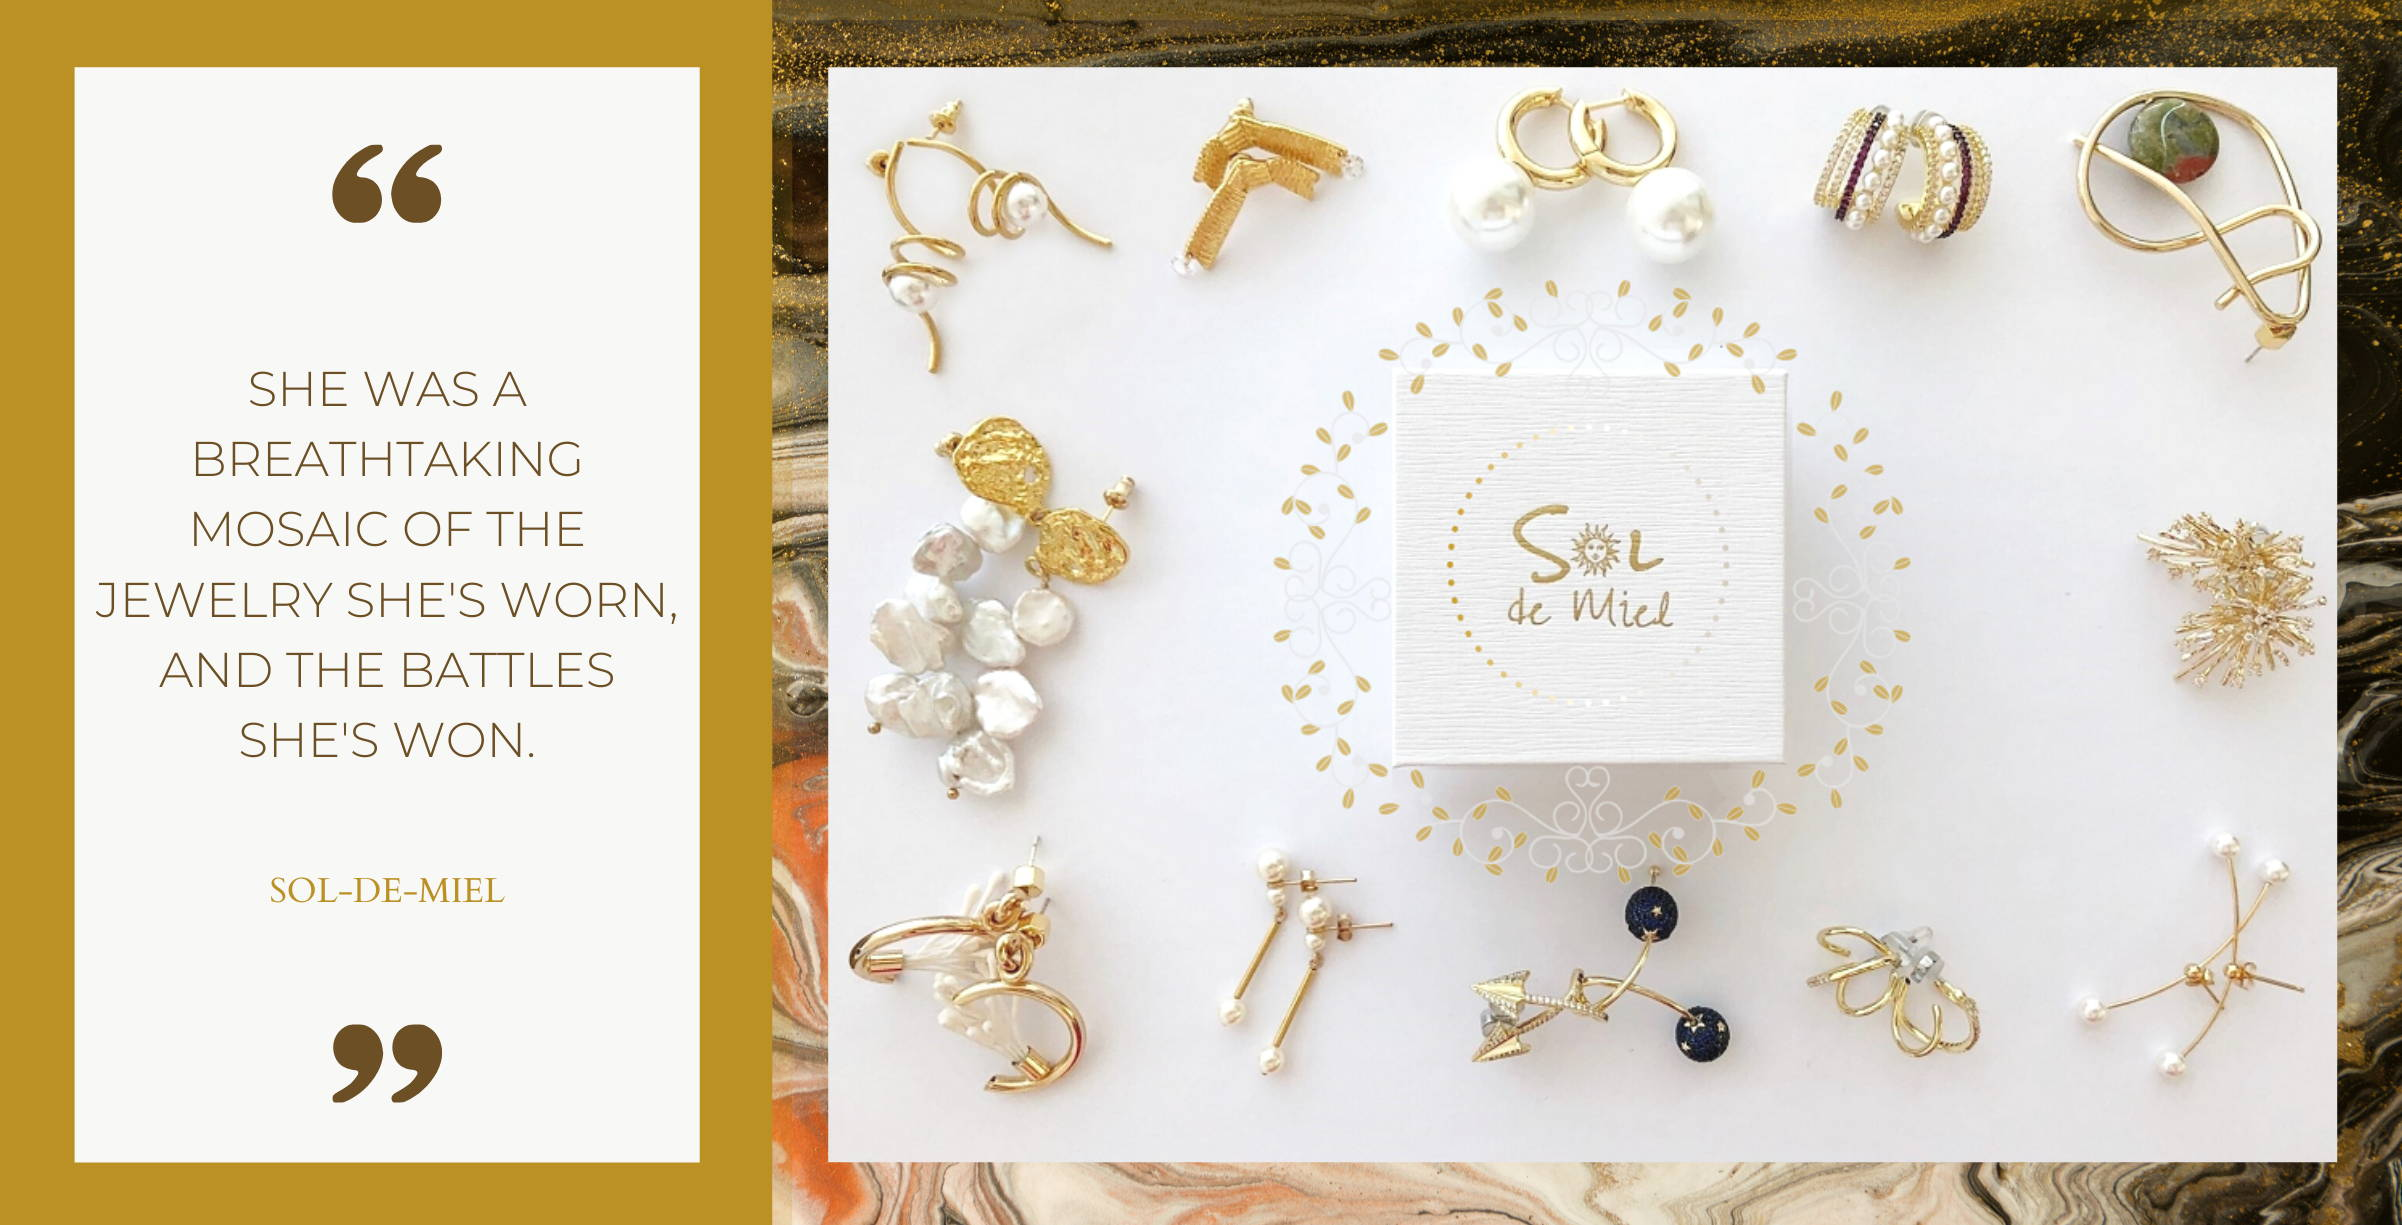 Sol-de-Miel Unique Artisan Jewelry Shop All Products